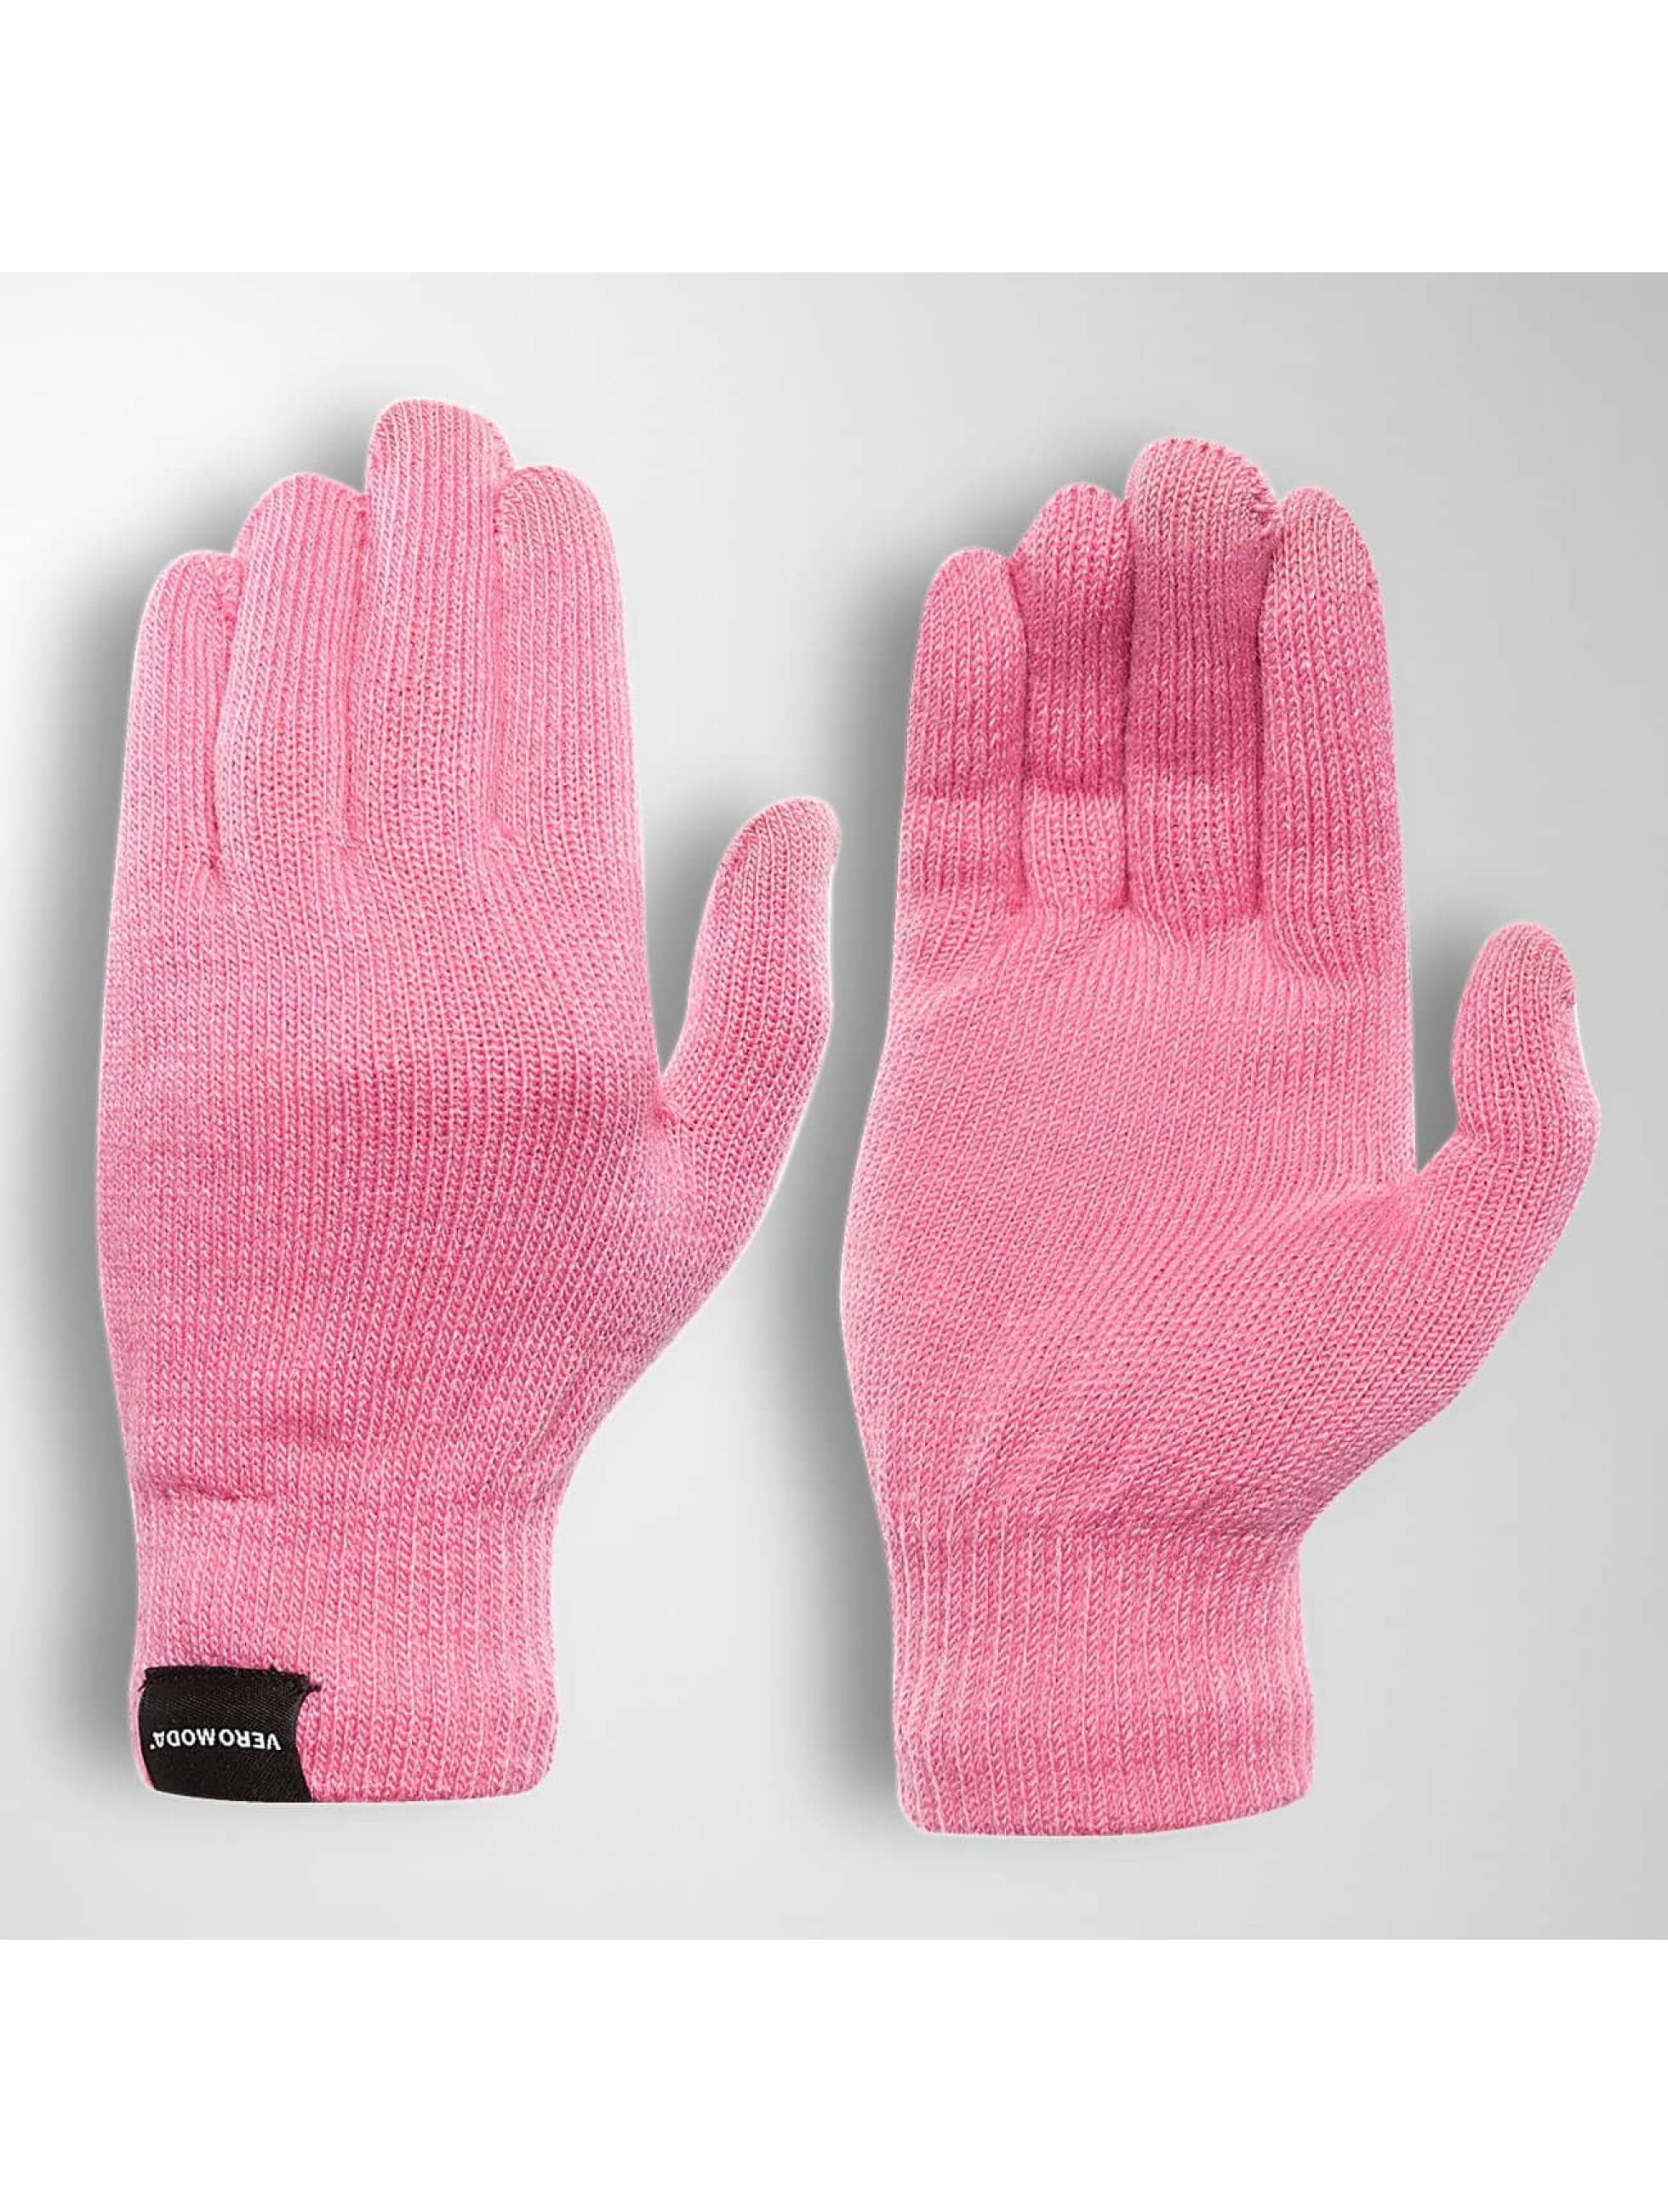 Vero Moda Frauen Handschuhe vmVilde in pink